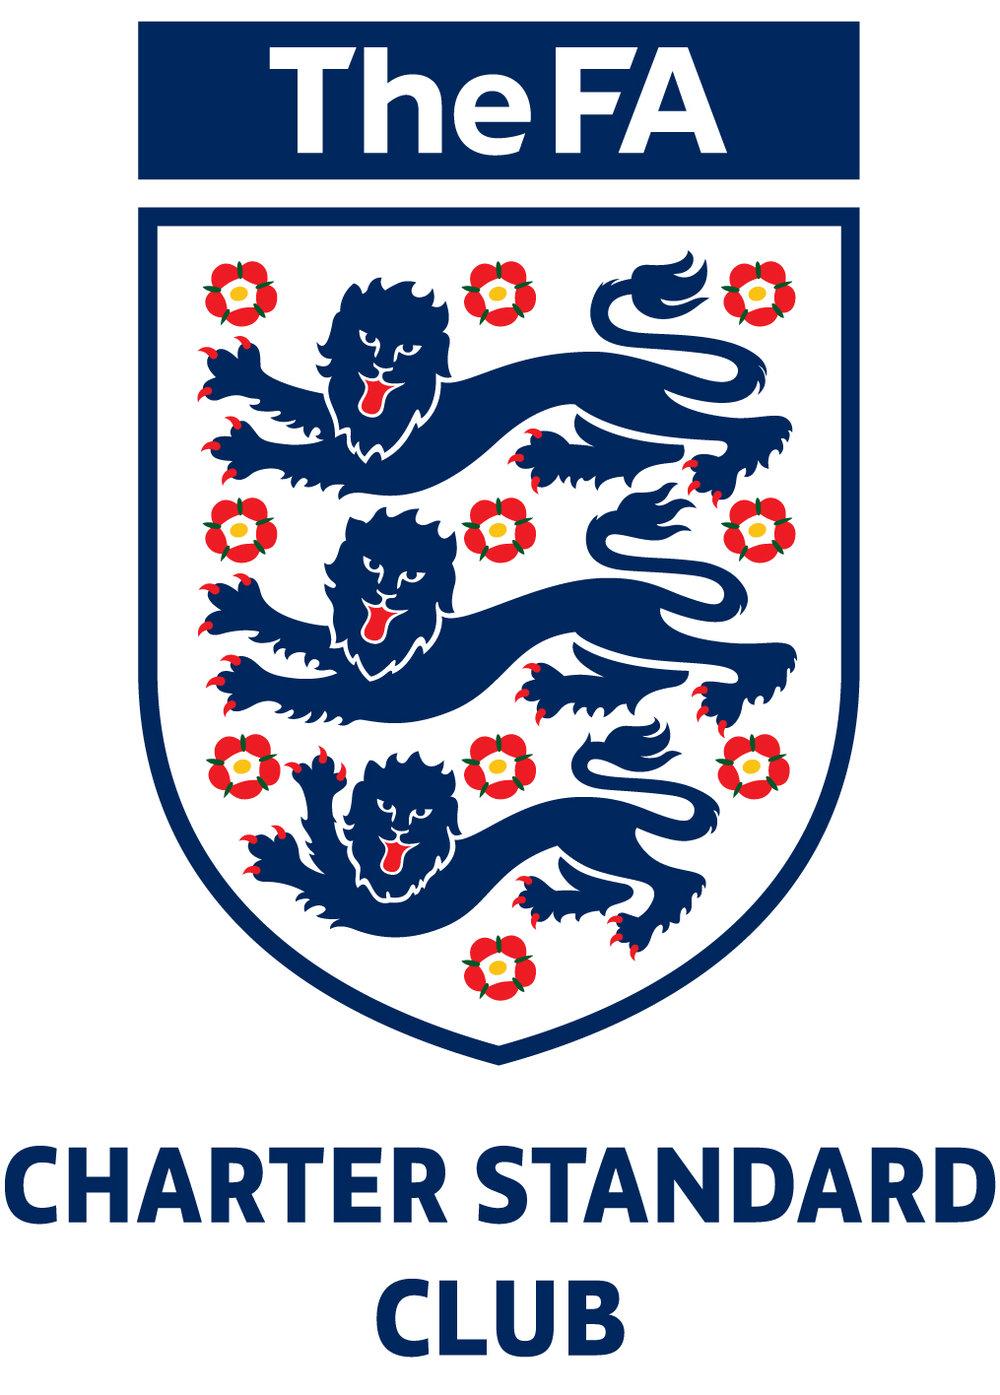 Charter_Standard_Club.jpg